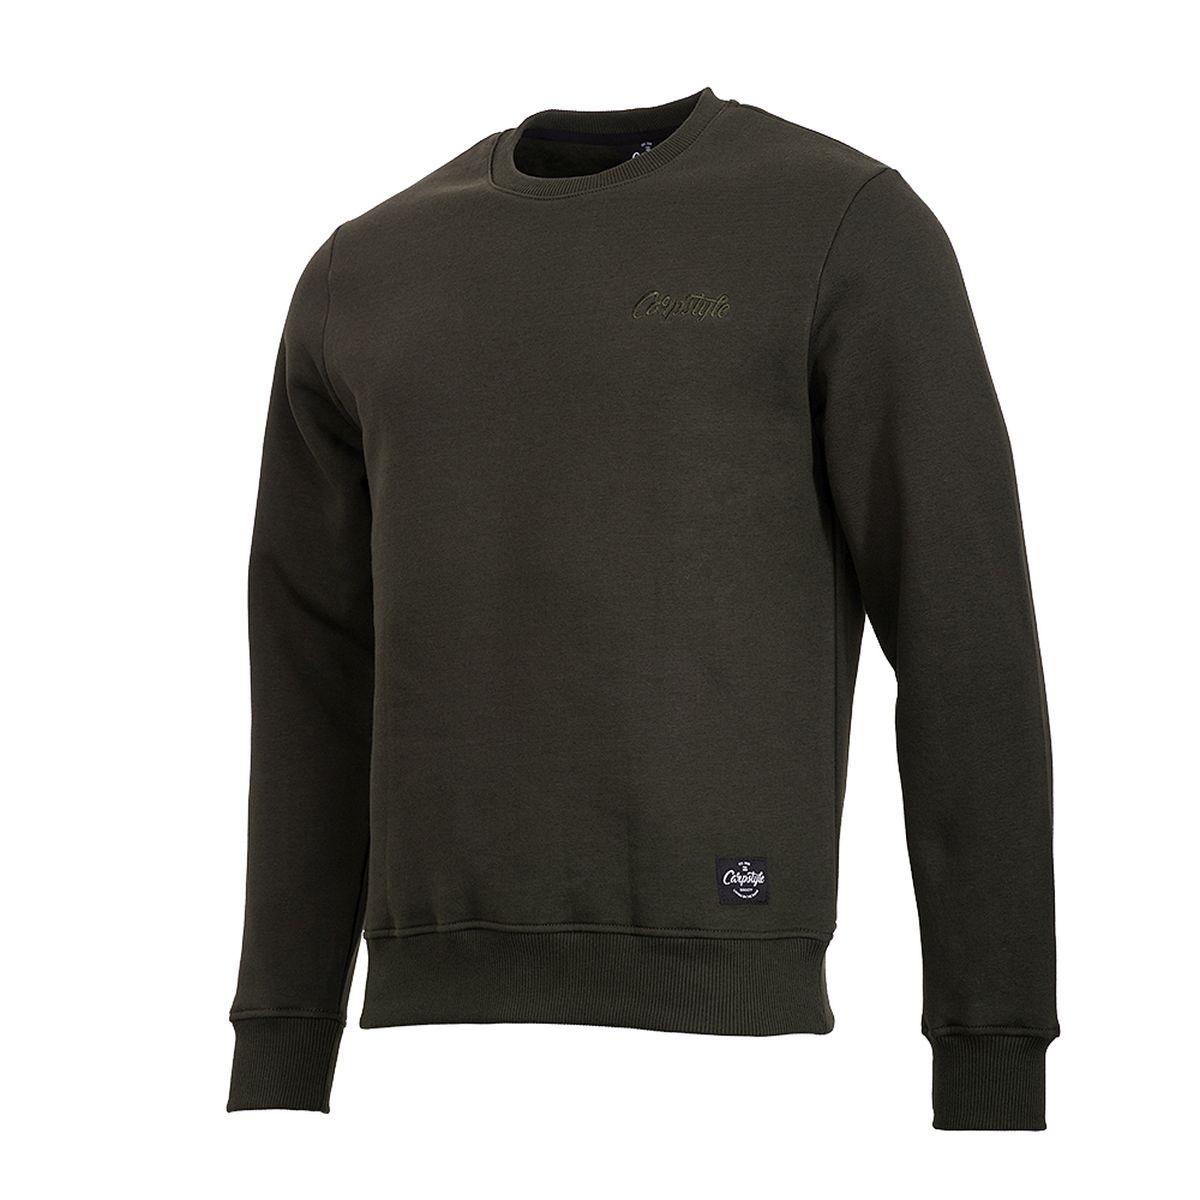 CARPSTYLE Bank Sweatshirt - M